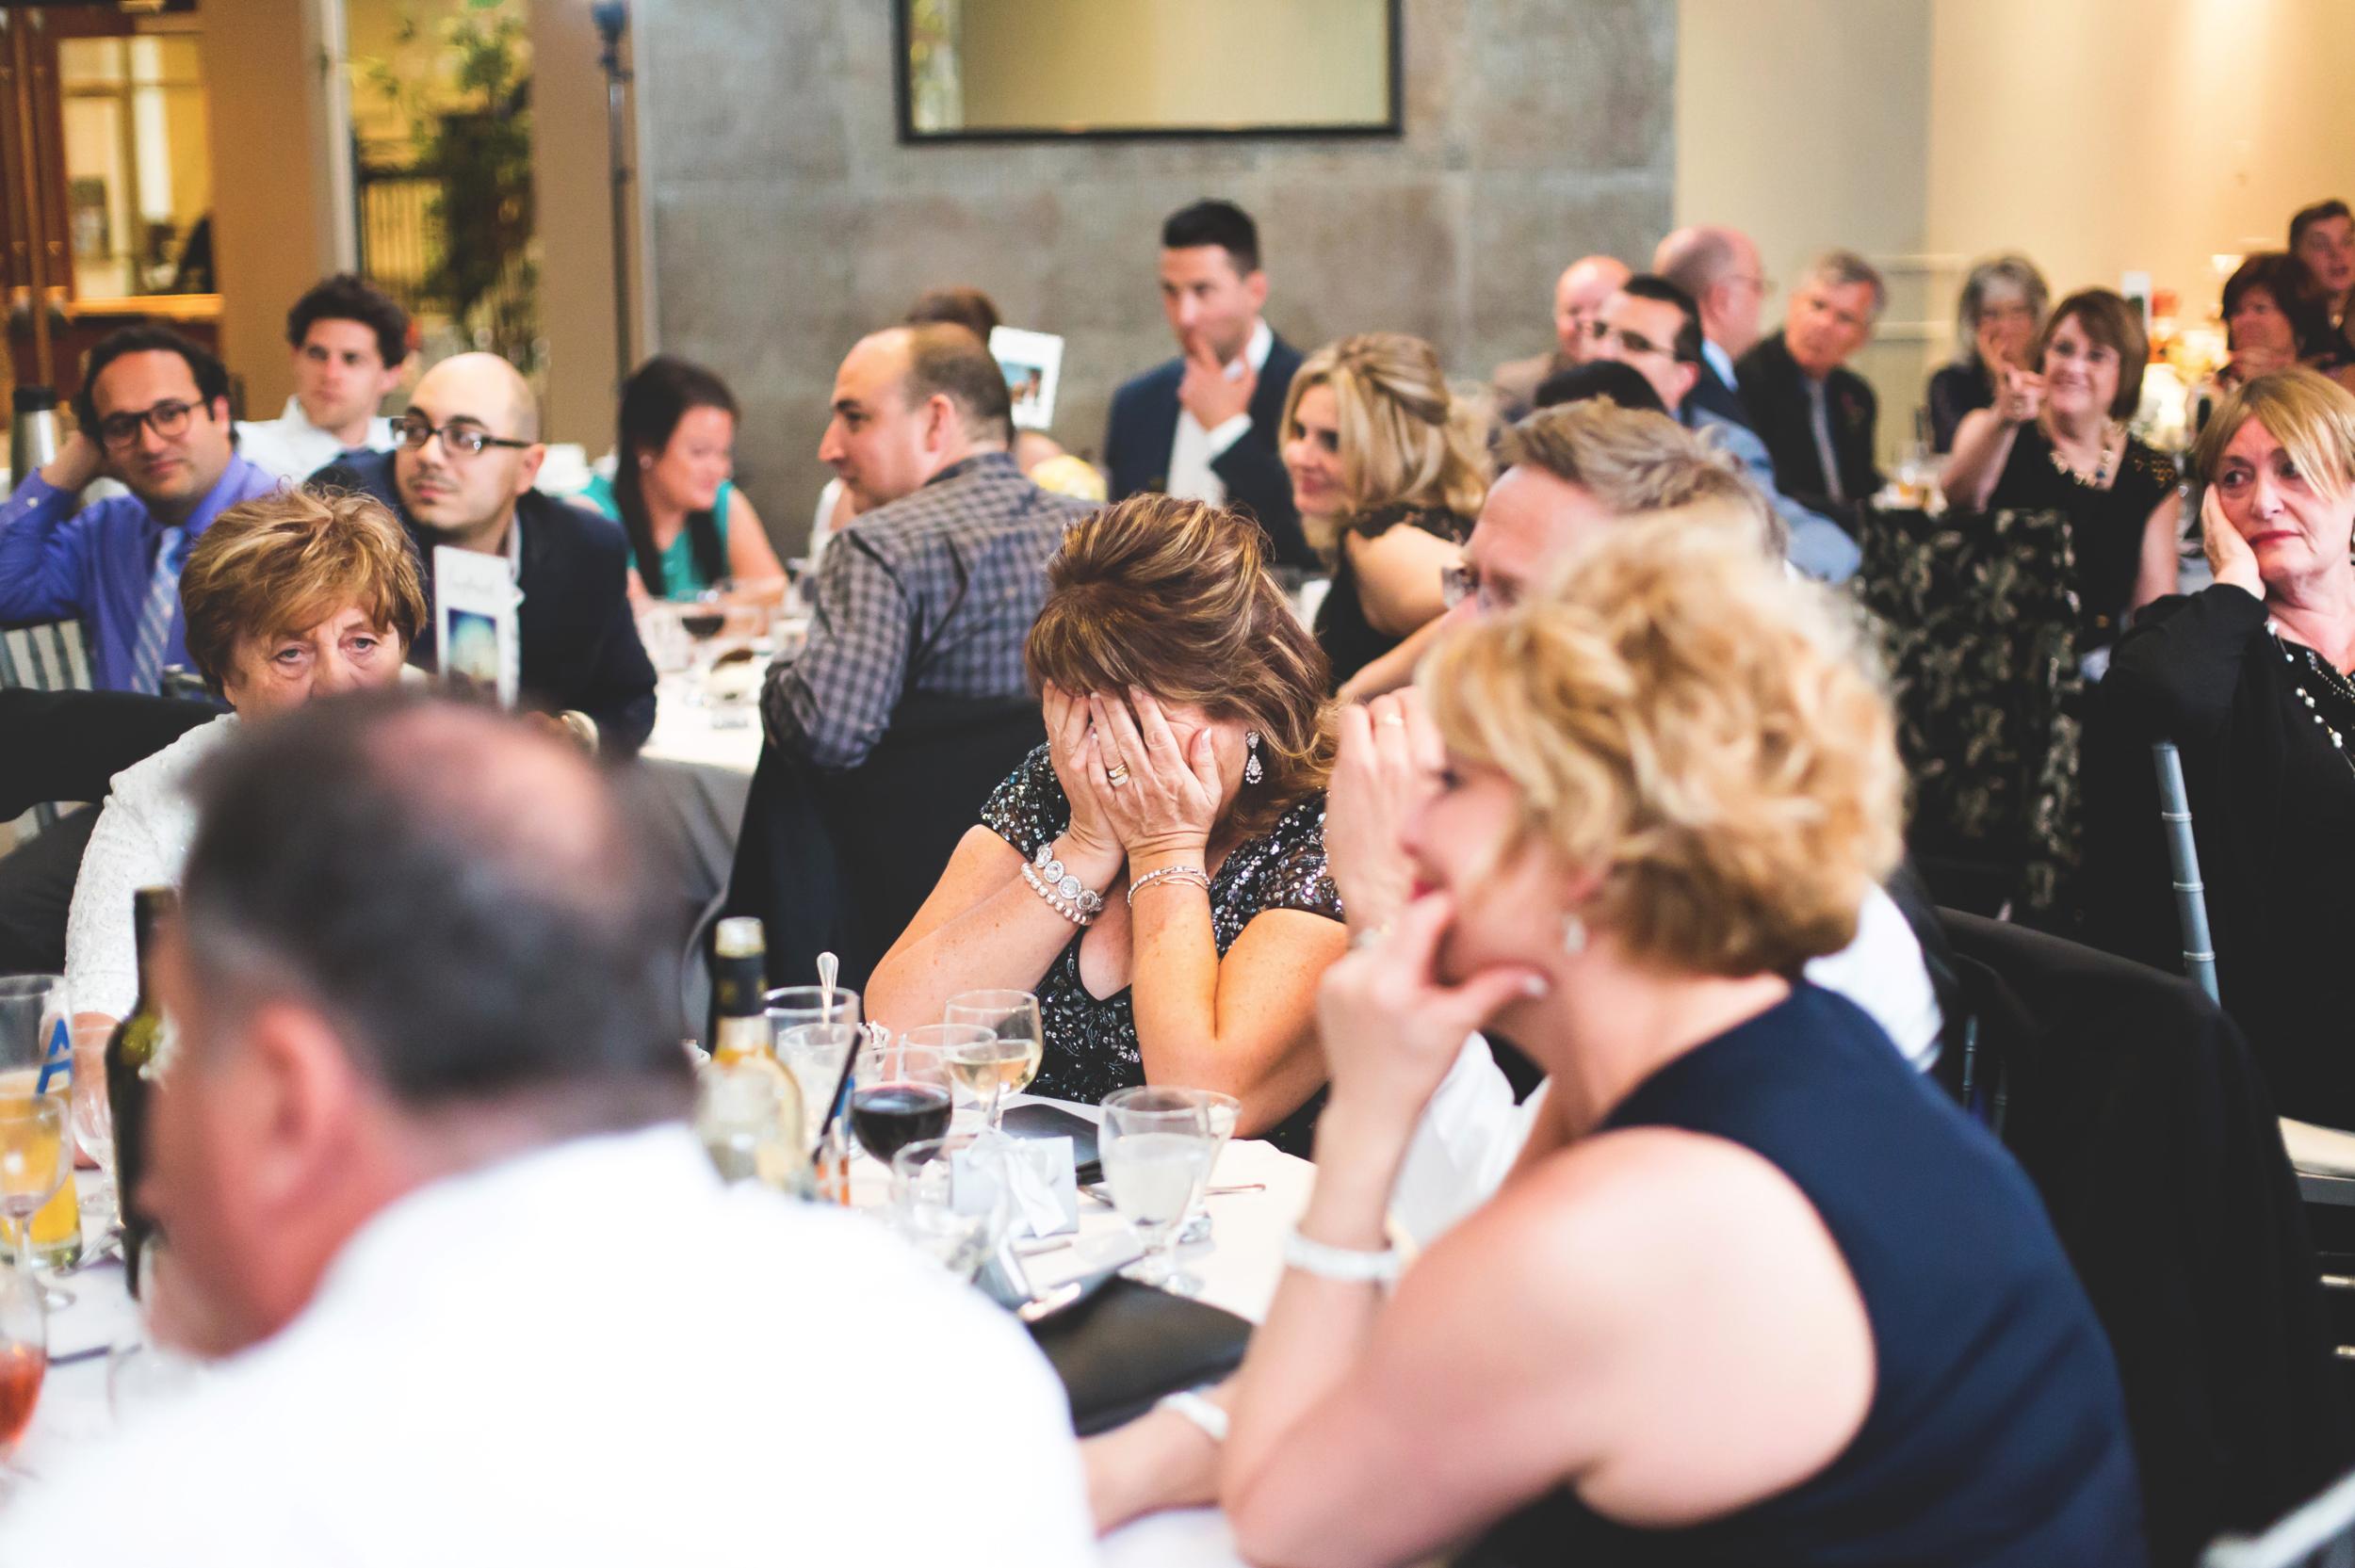 Wedding-Harbour-Banquet-Center-Oakville-Photographer-Wedding-Hamilton-Saint-James-Espresso-Downtown-HamOnt-GTA-Niagara-Toronto-Moments-by-Lauren-Photography-Photo-Image-69.png